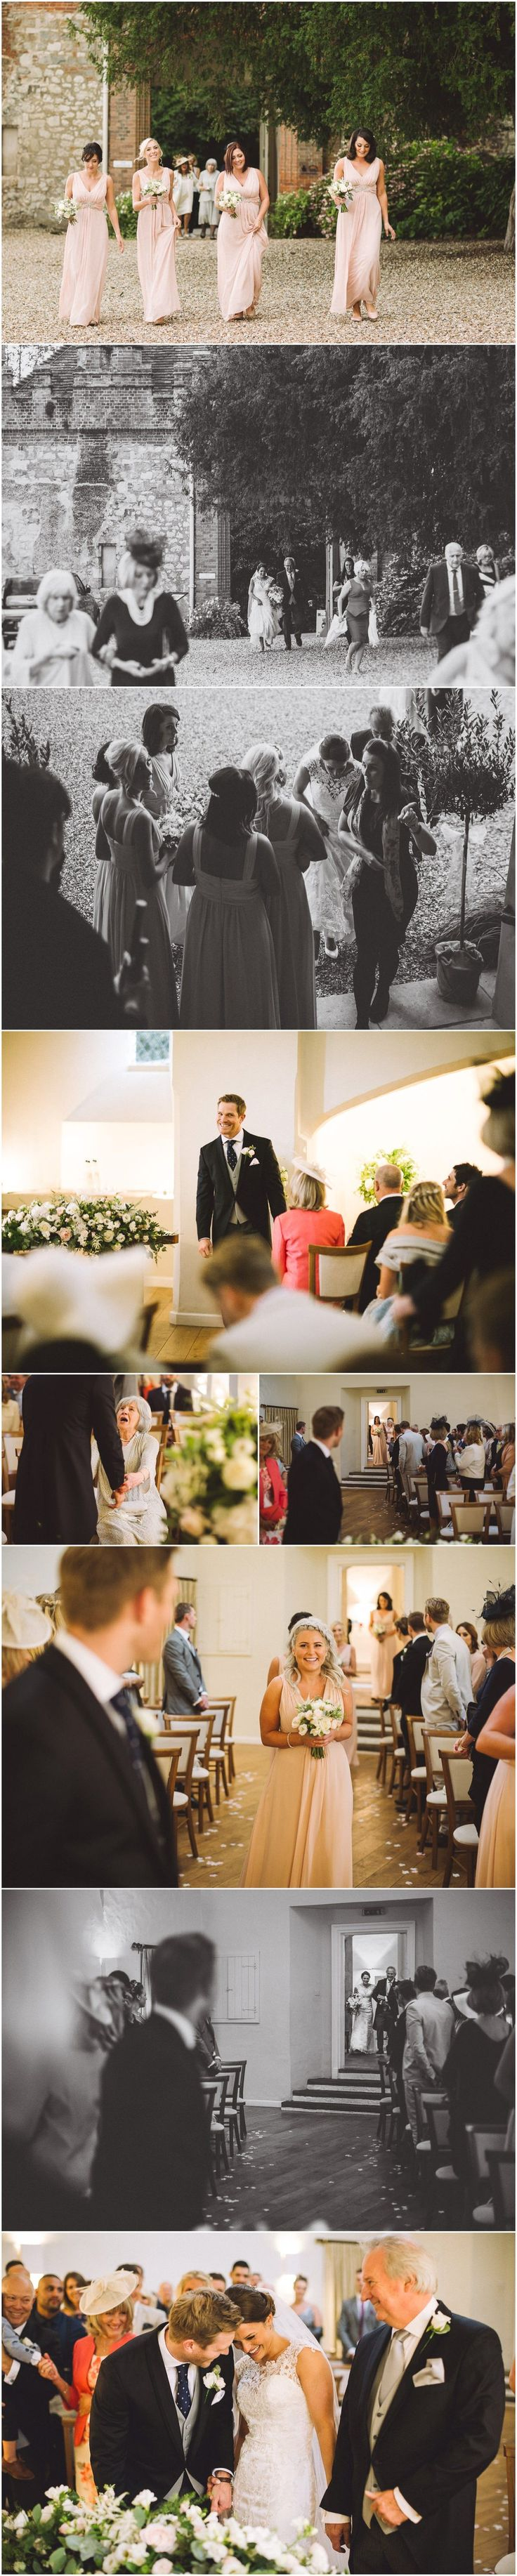 wedding-photographer-surrey Flowers by Eden Blooms www.edenblooms.co.uk